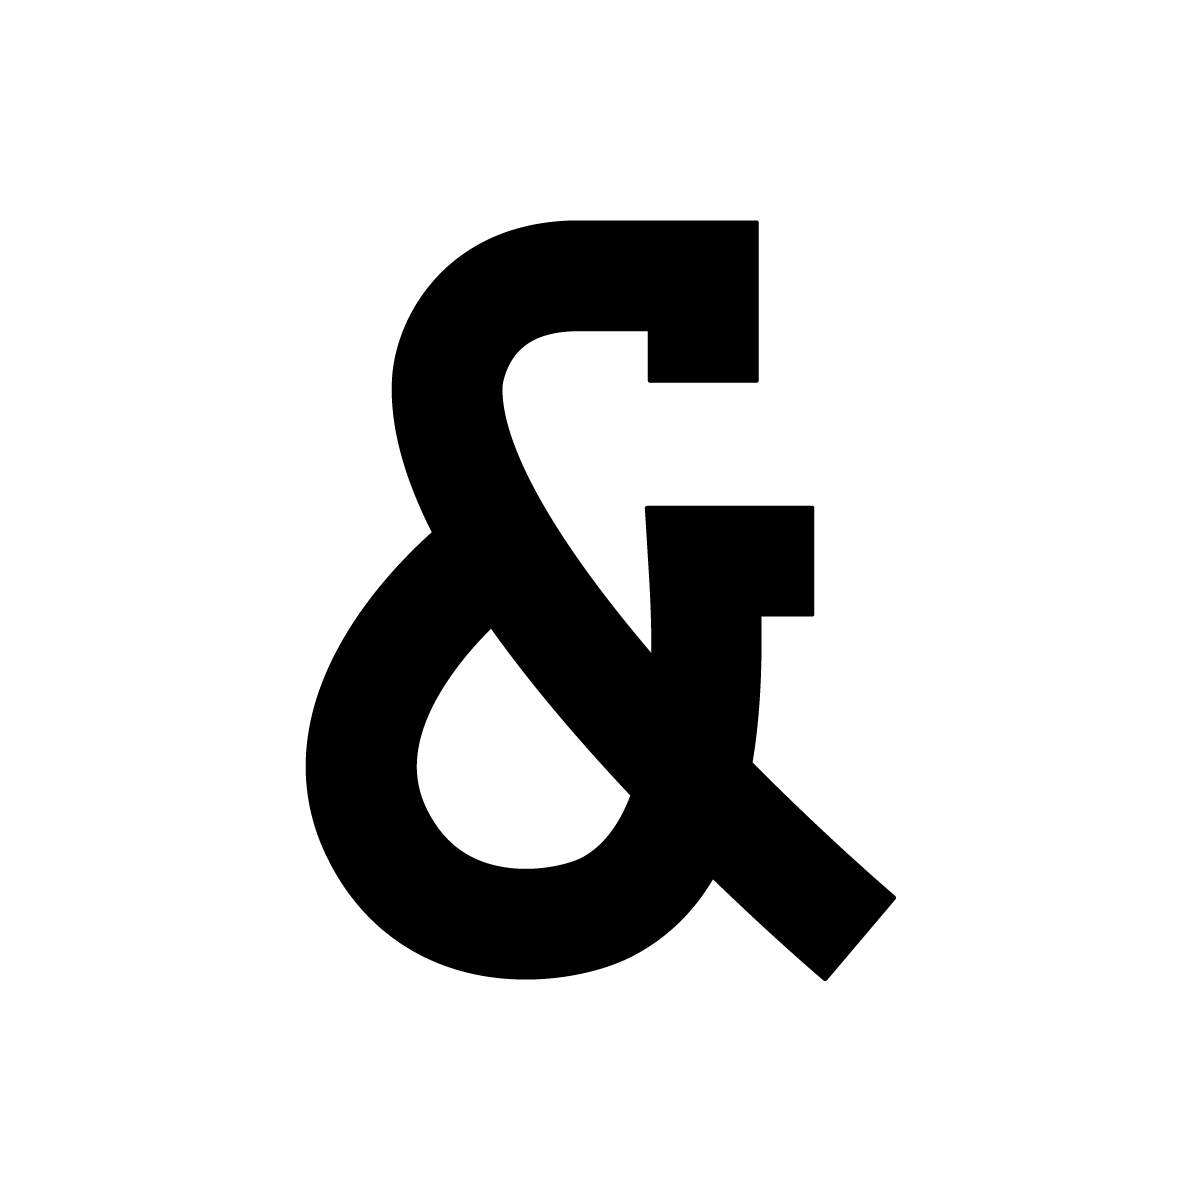 Ampersand_FNL-07.png